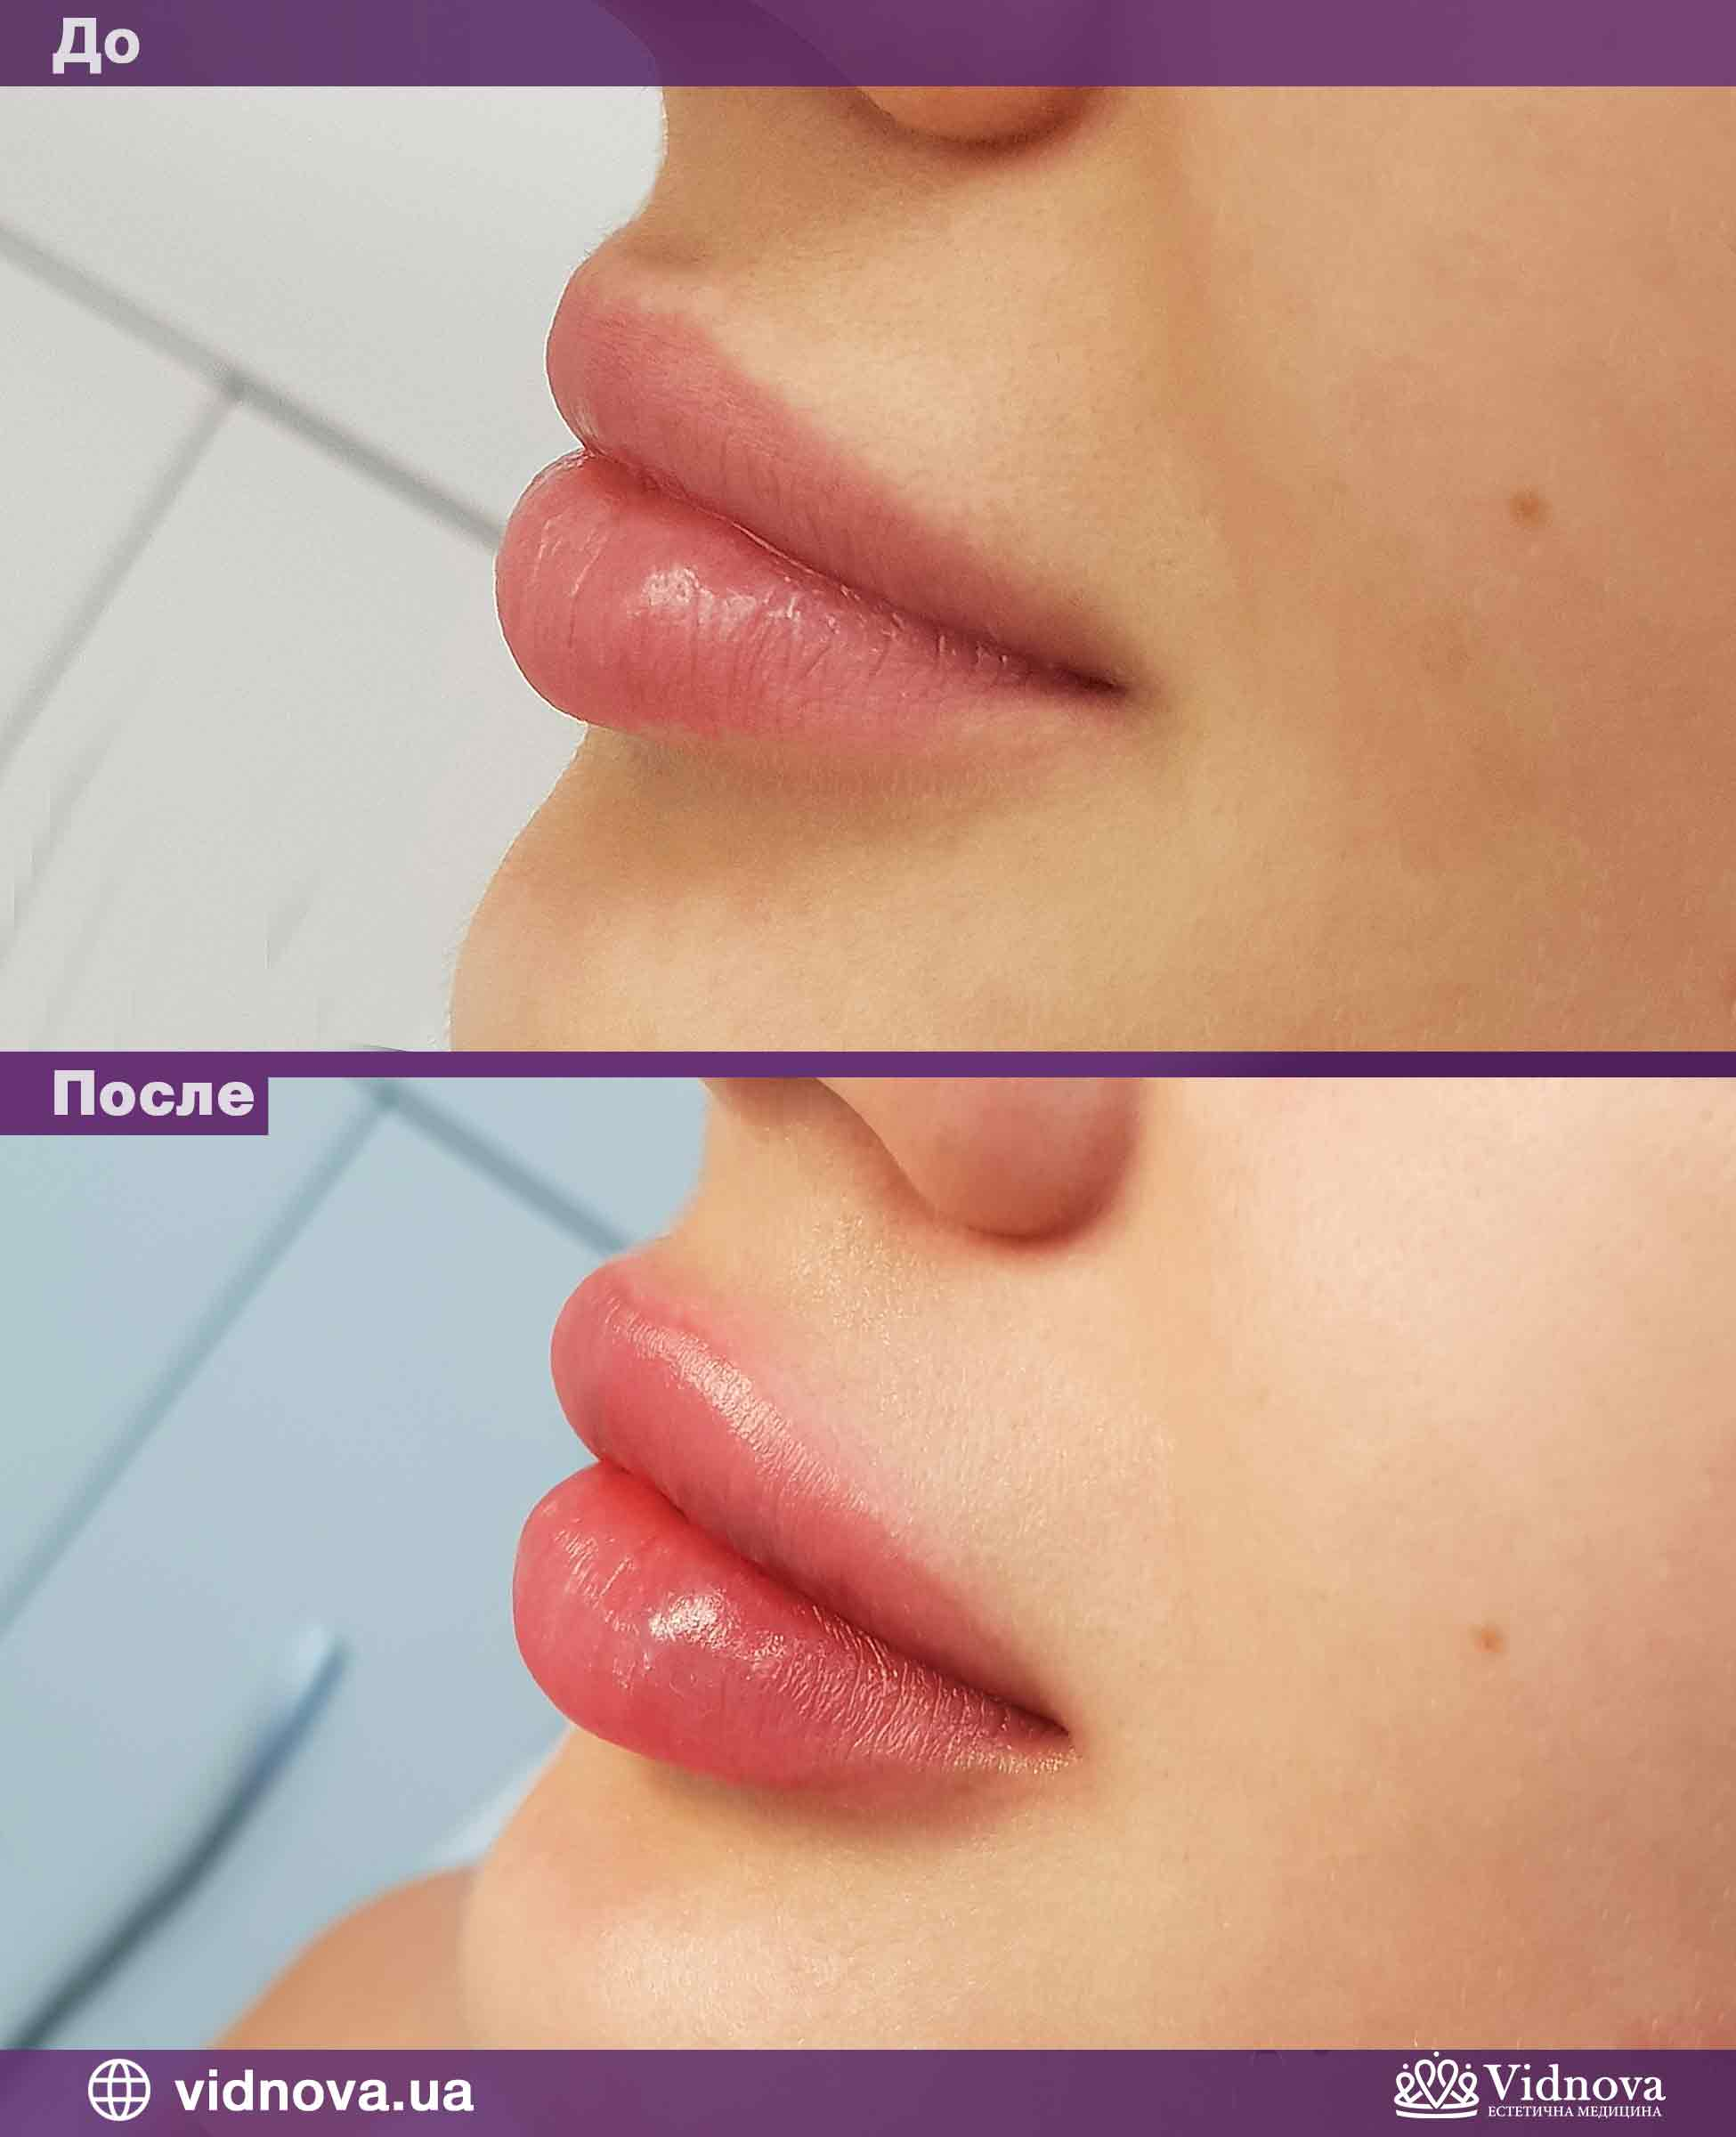 Увеличение губ: Фото До и После - Пример №4-3 - Клиника Vidnova